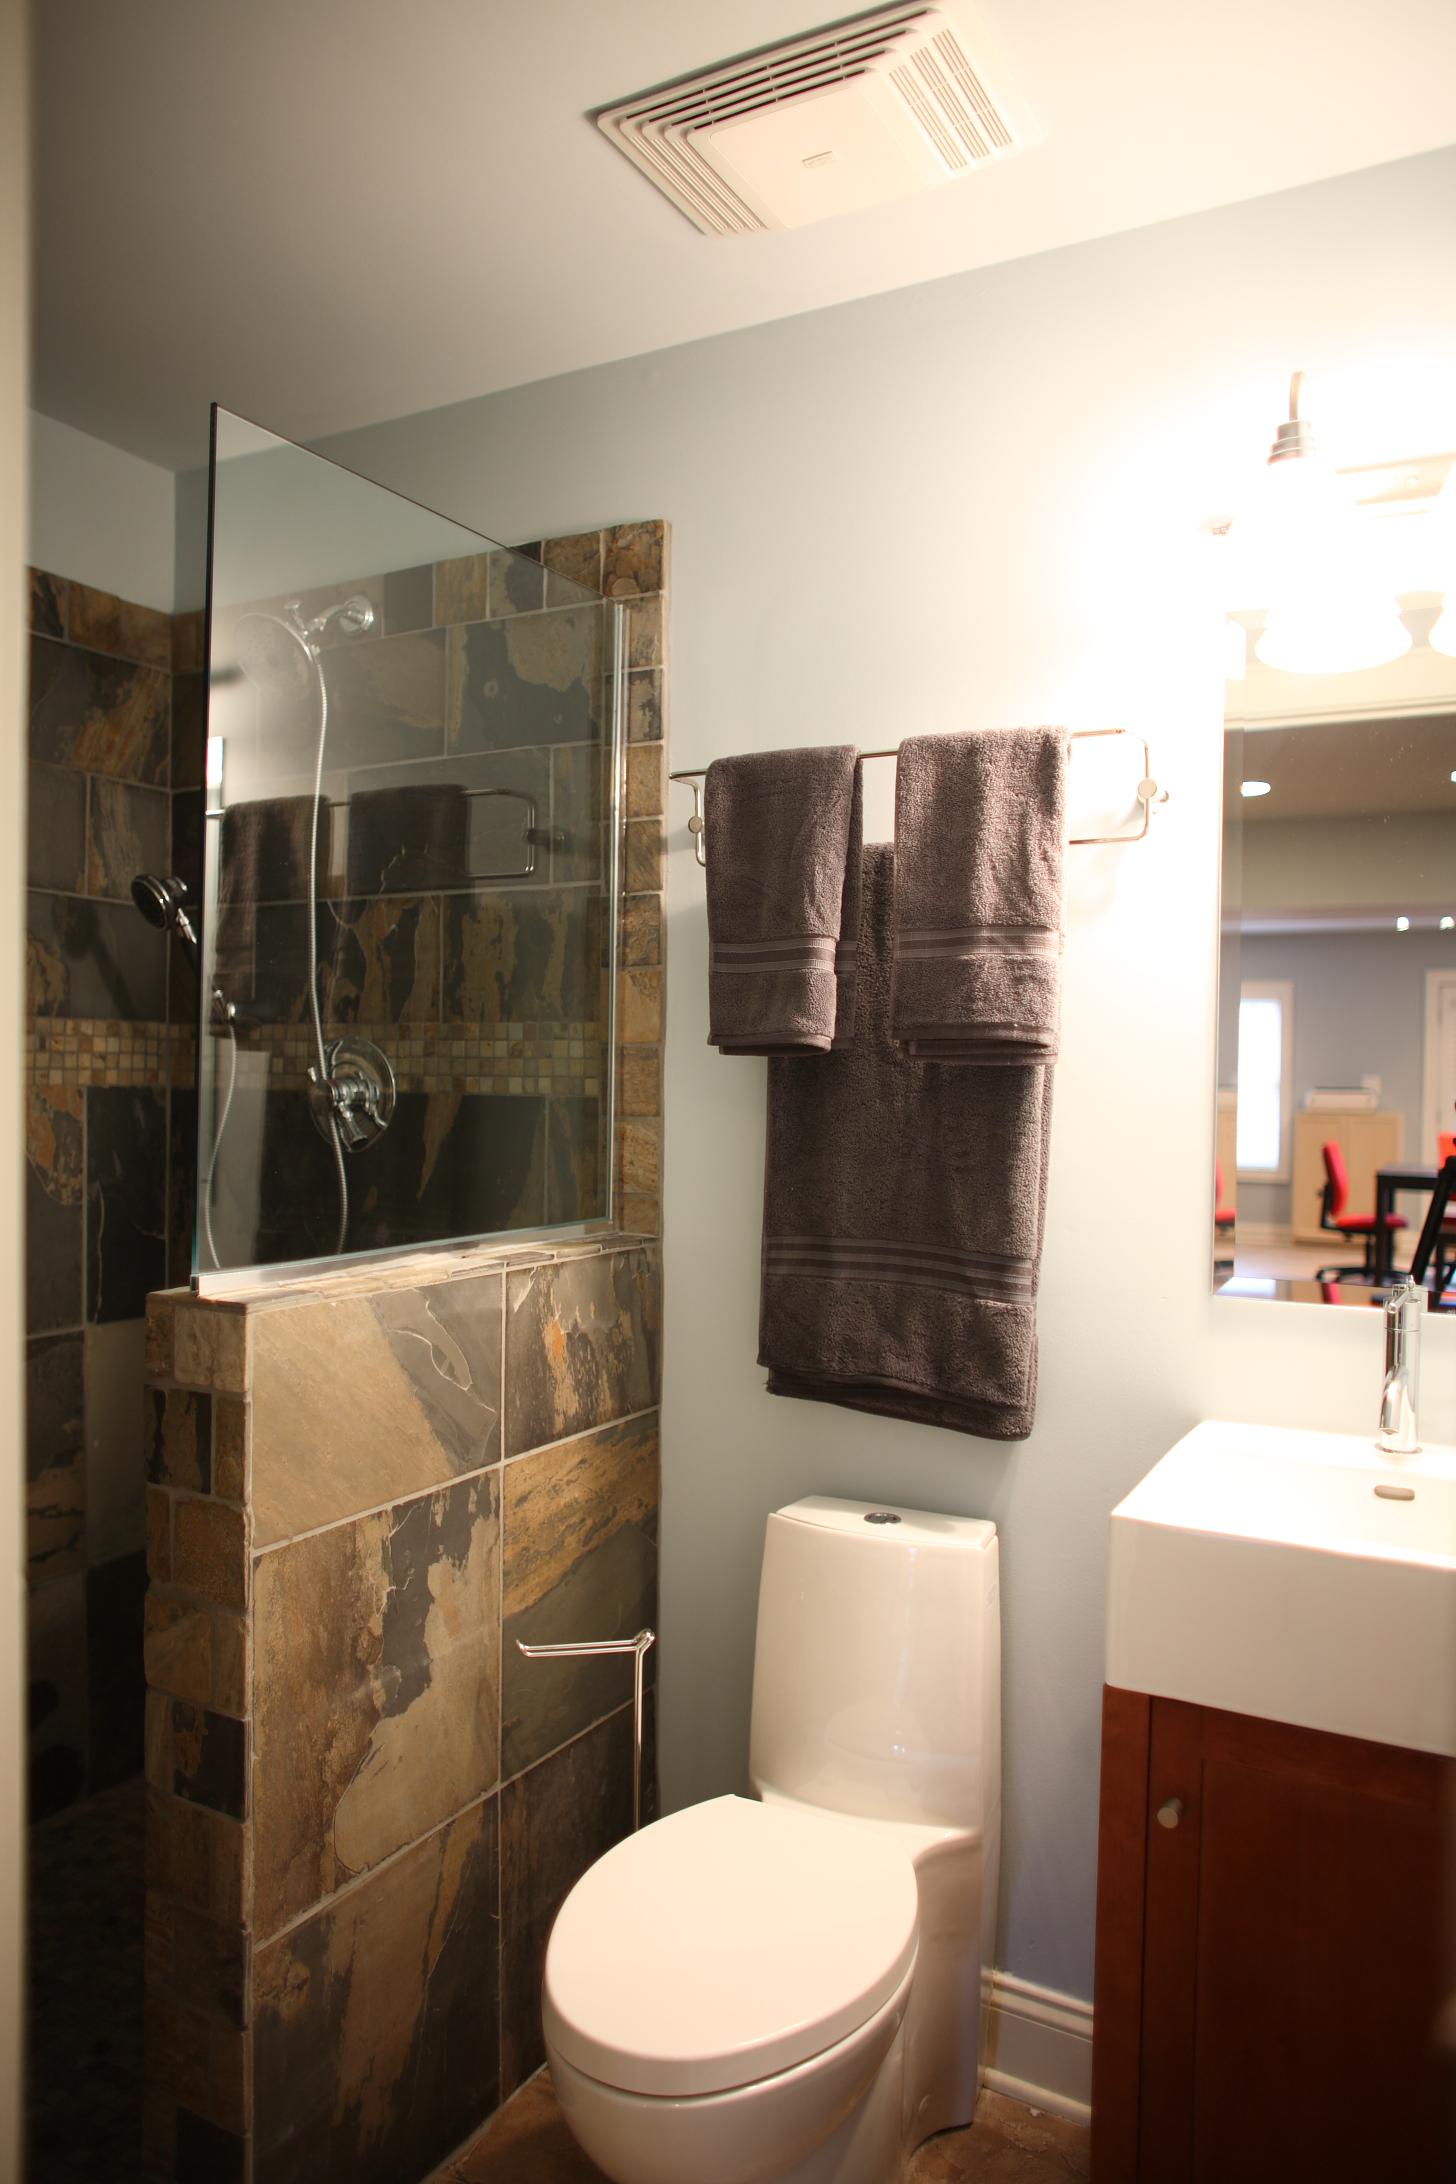 Full bathroom in basement finish